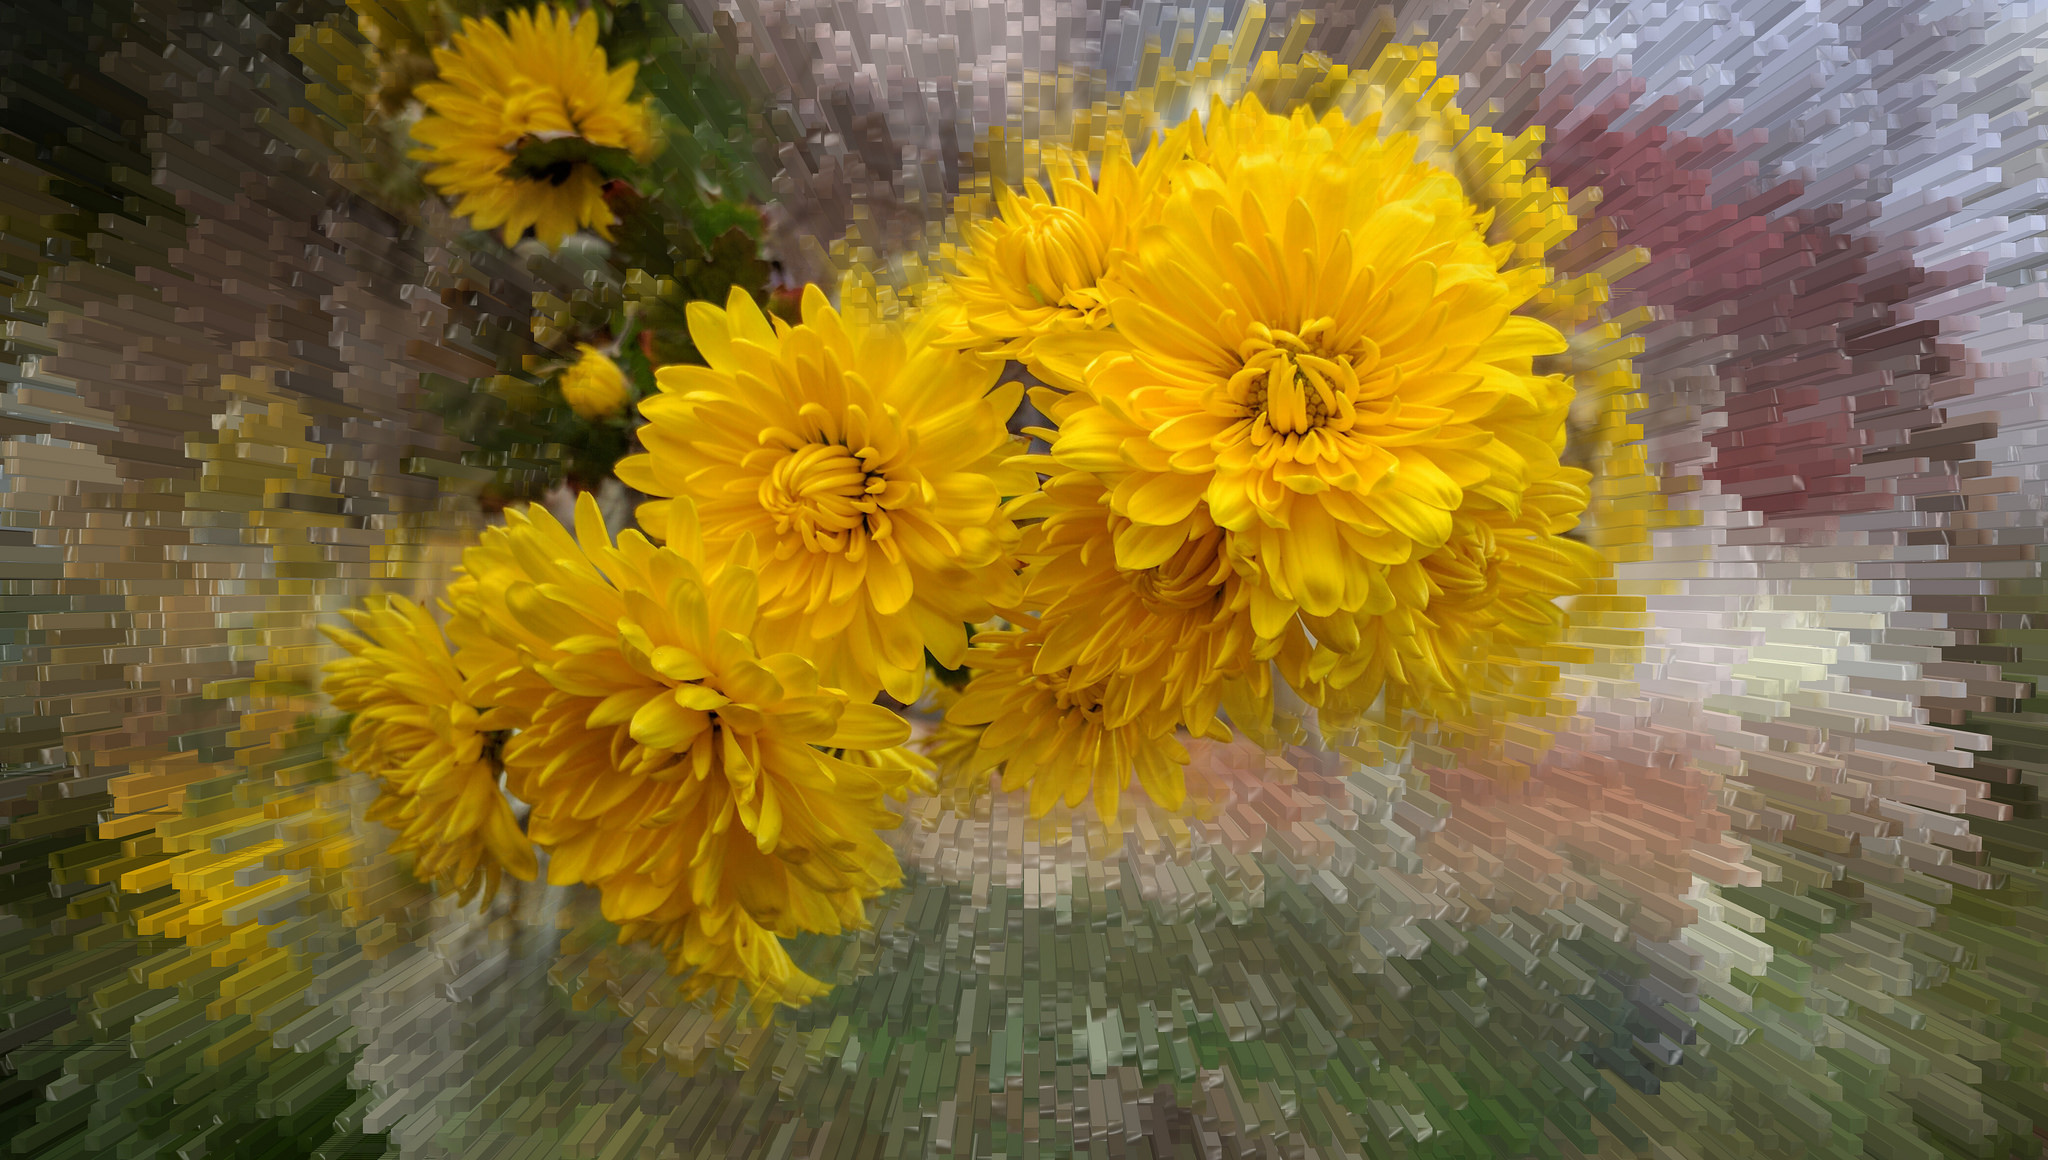 обои цветочная фантазия, цветы, букет, флора картинки фото